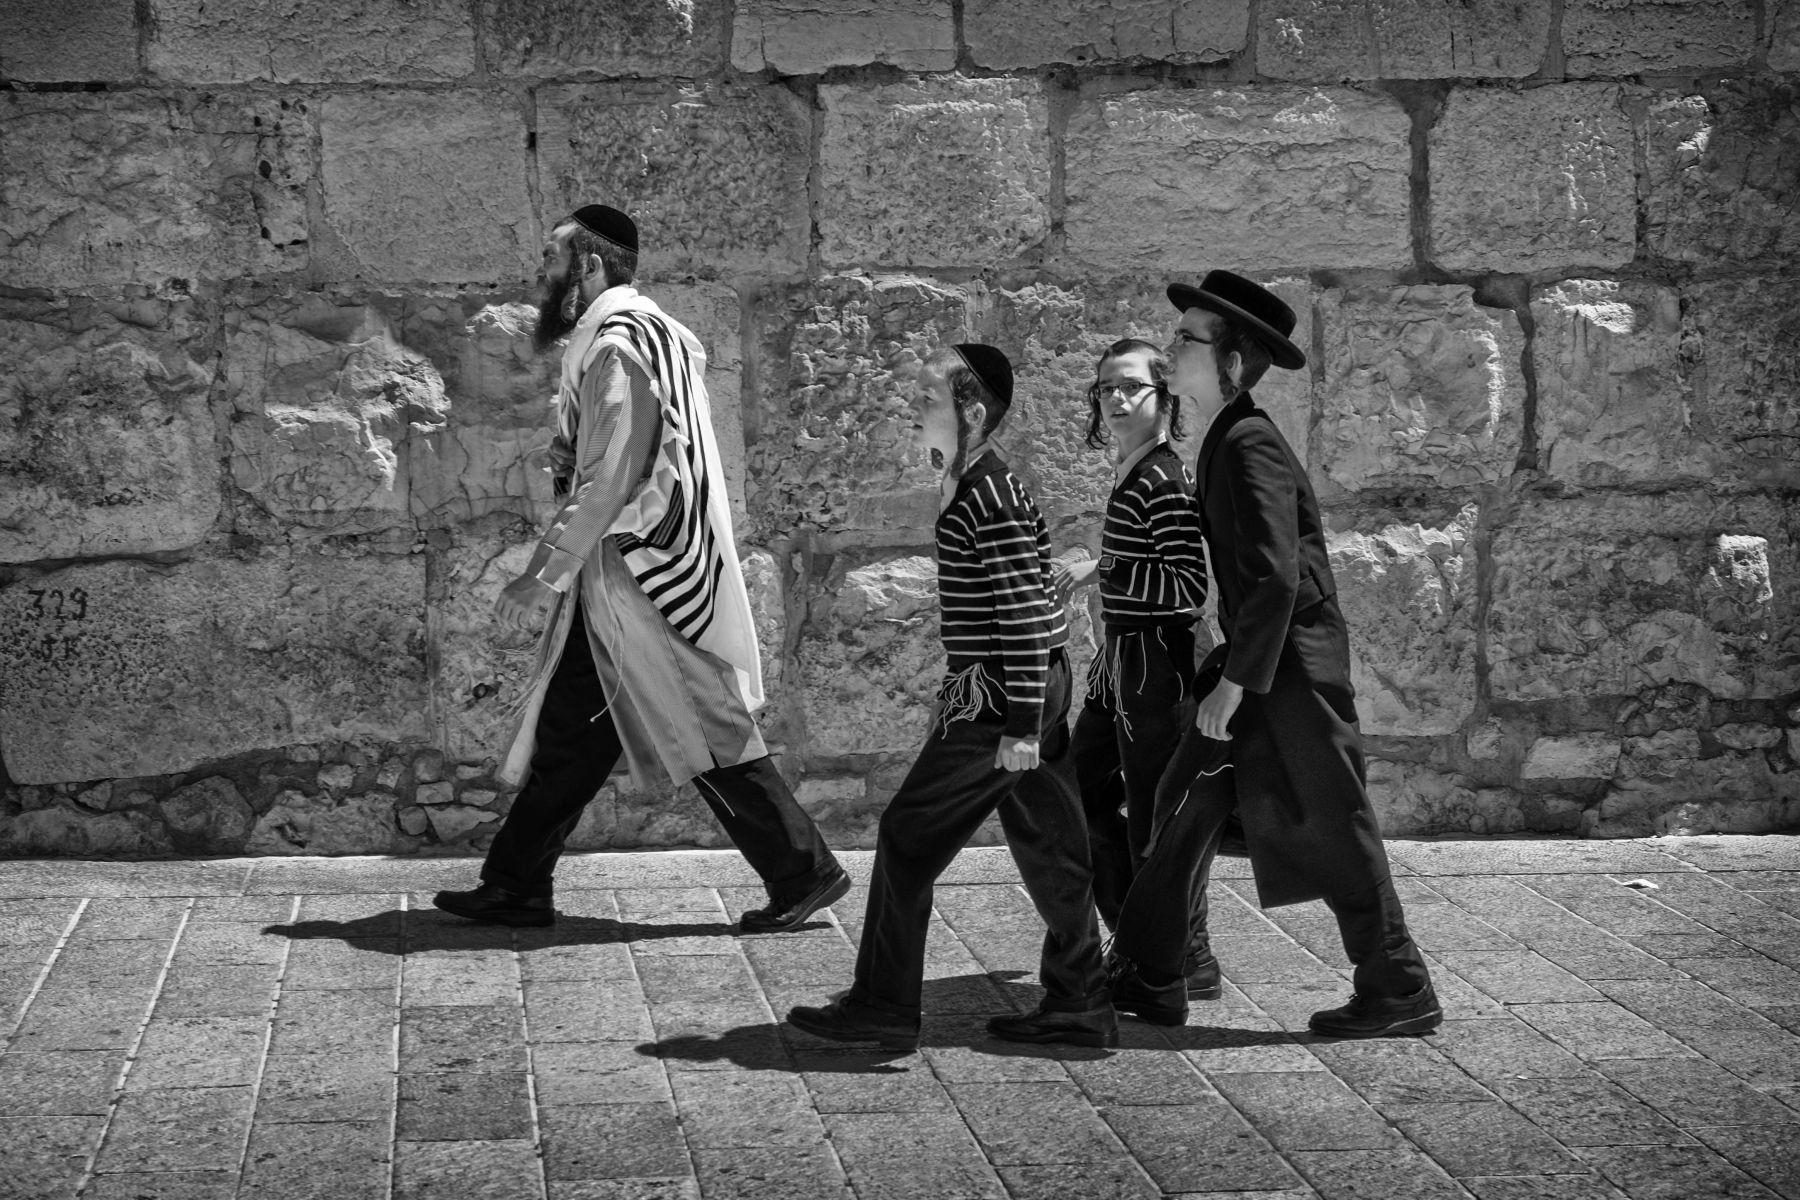 Jerusalem, Israel 04/25/15